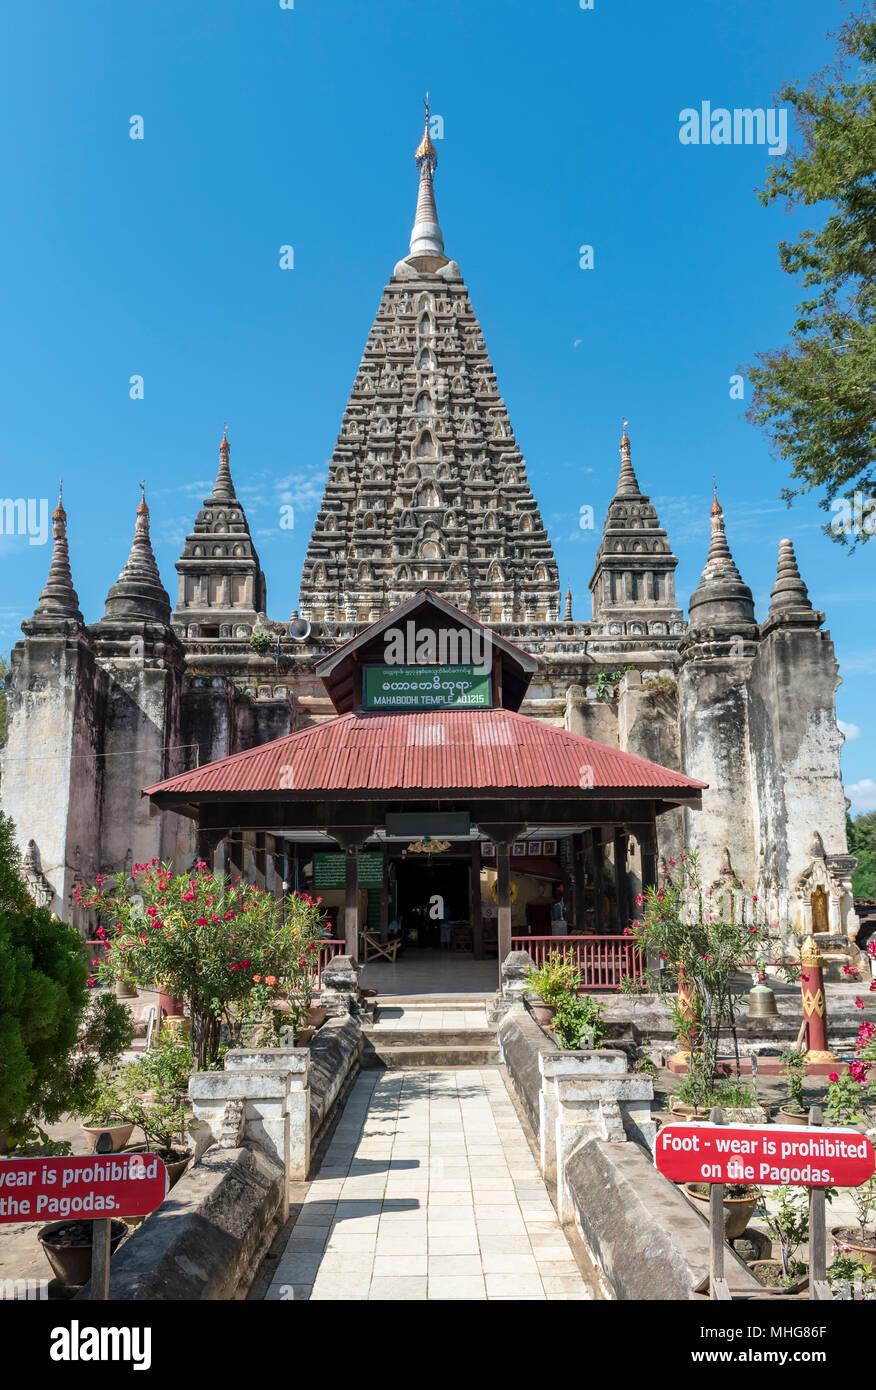 Maha Bodhi Pagoda (Mahabodhi paya), Old Bagan, Myanmar (Burma) Stock Photo